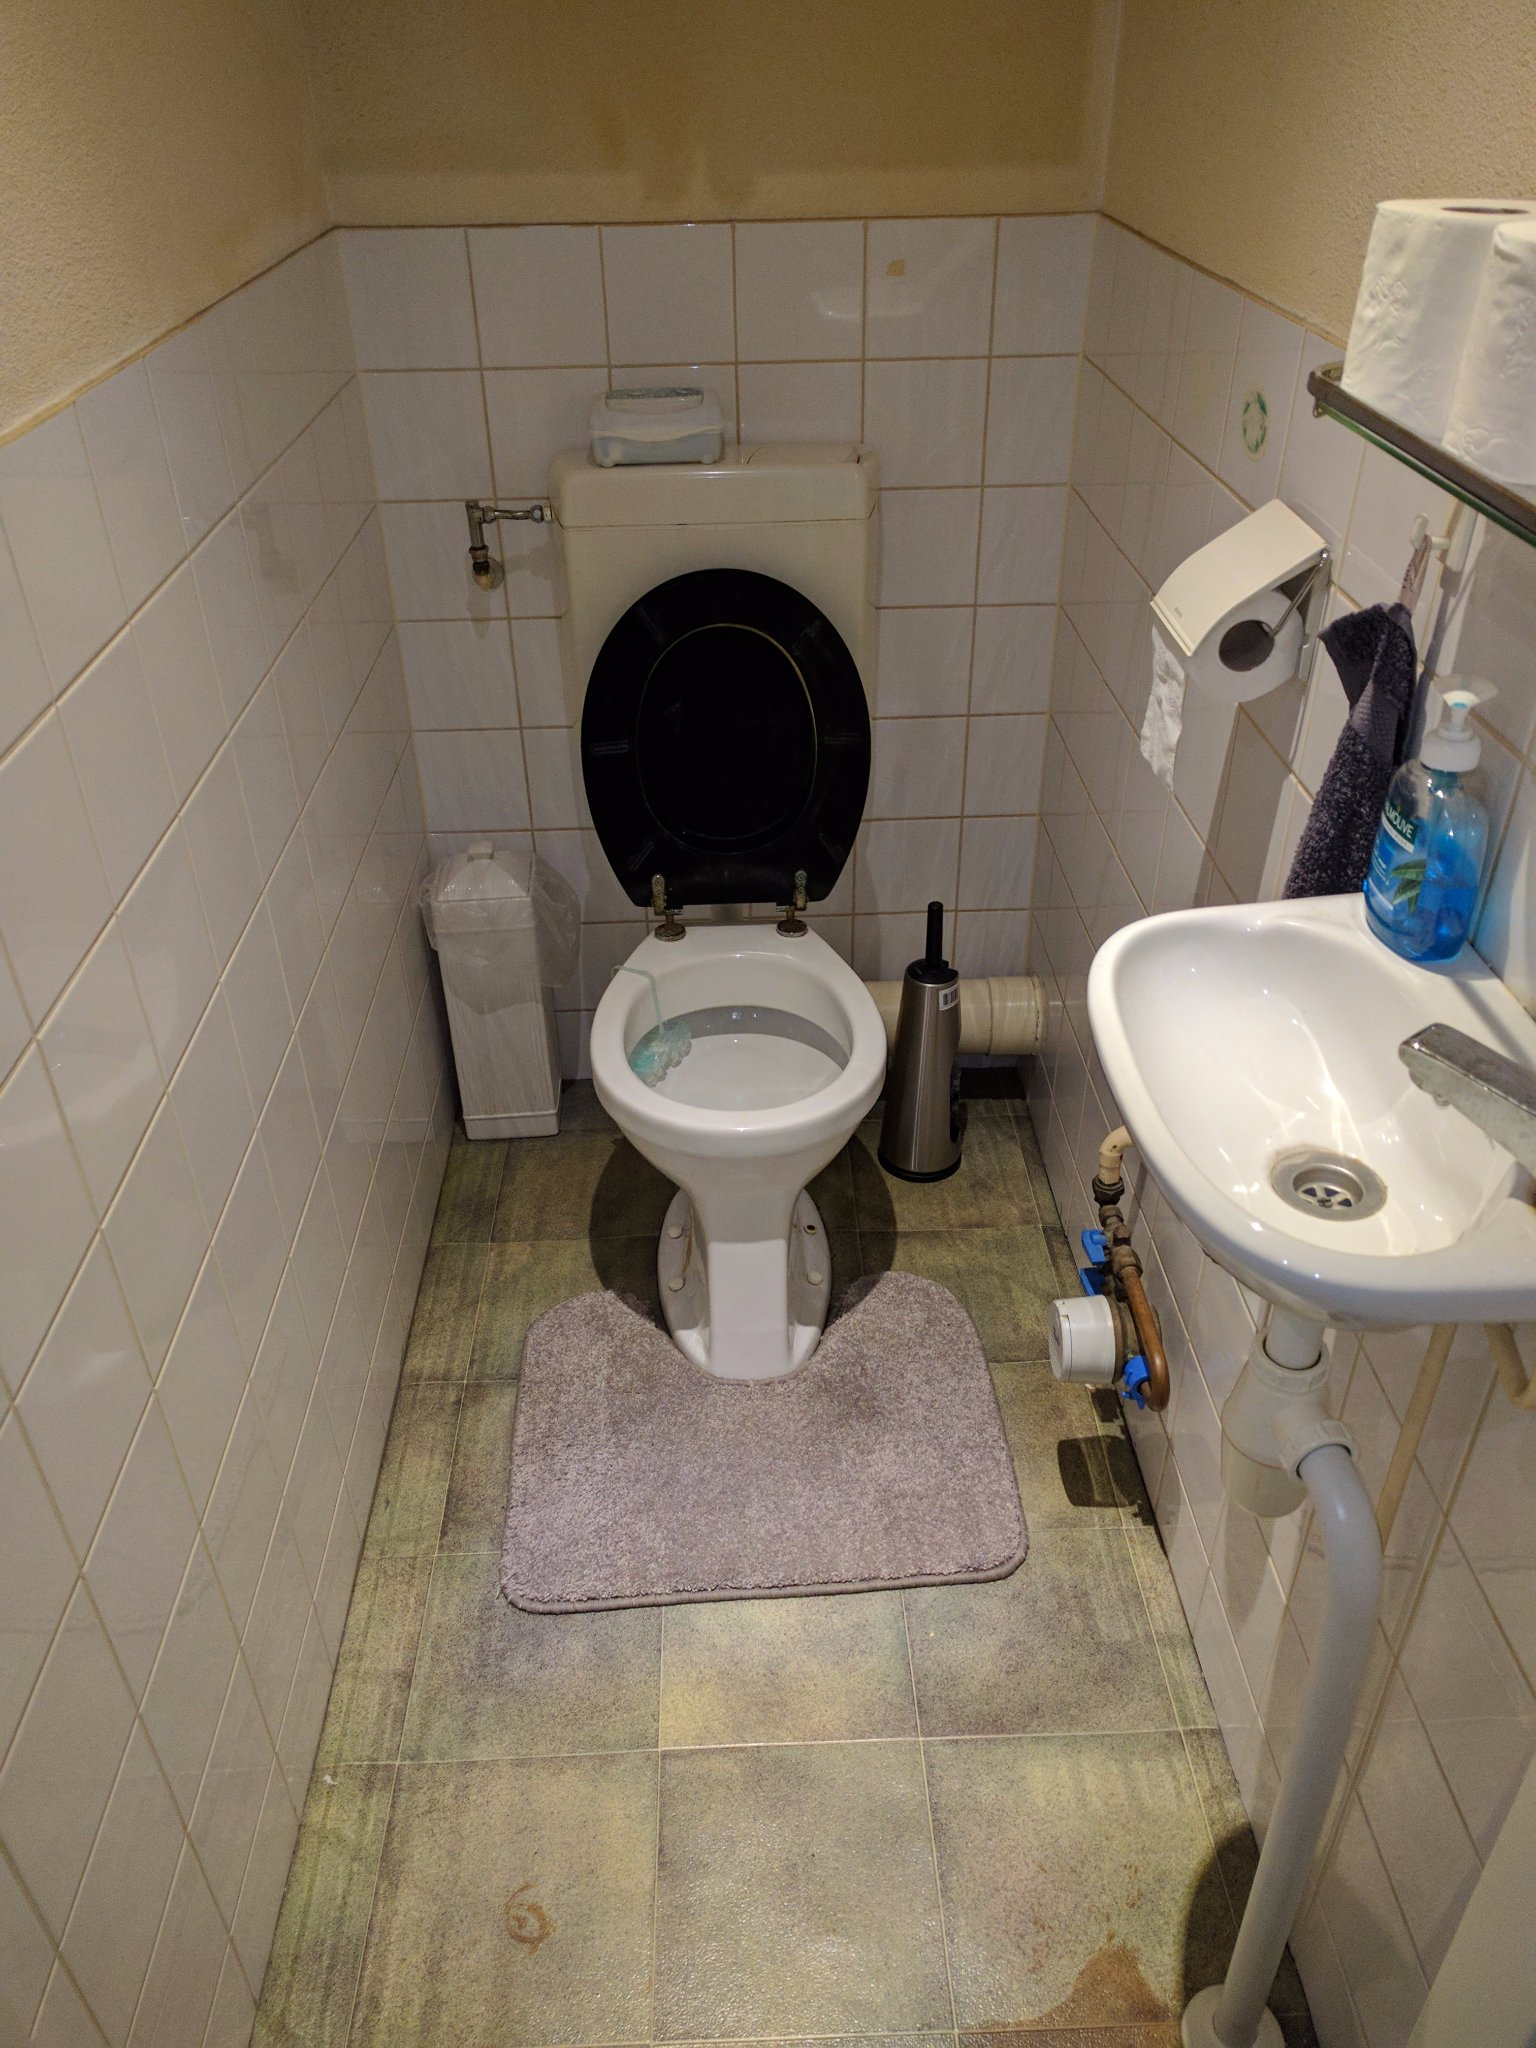 Toiletruimte Renoveren Tegels Leggen Werkspot